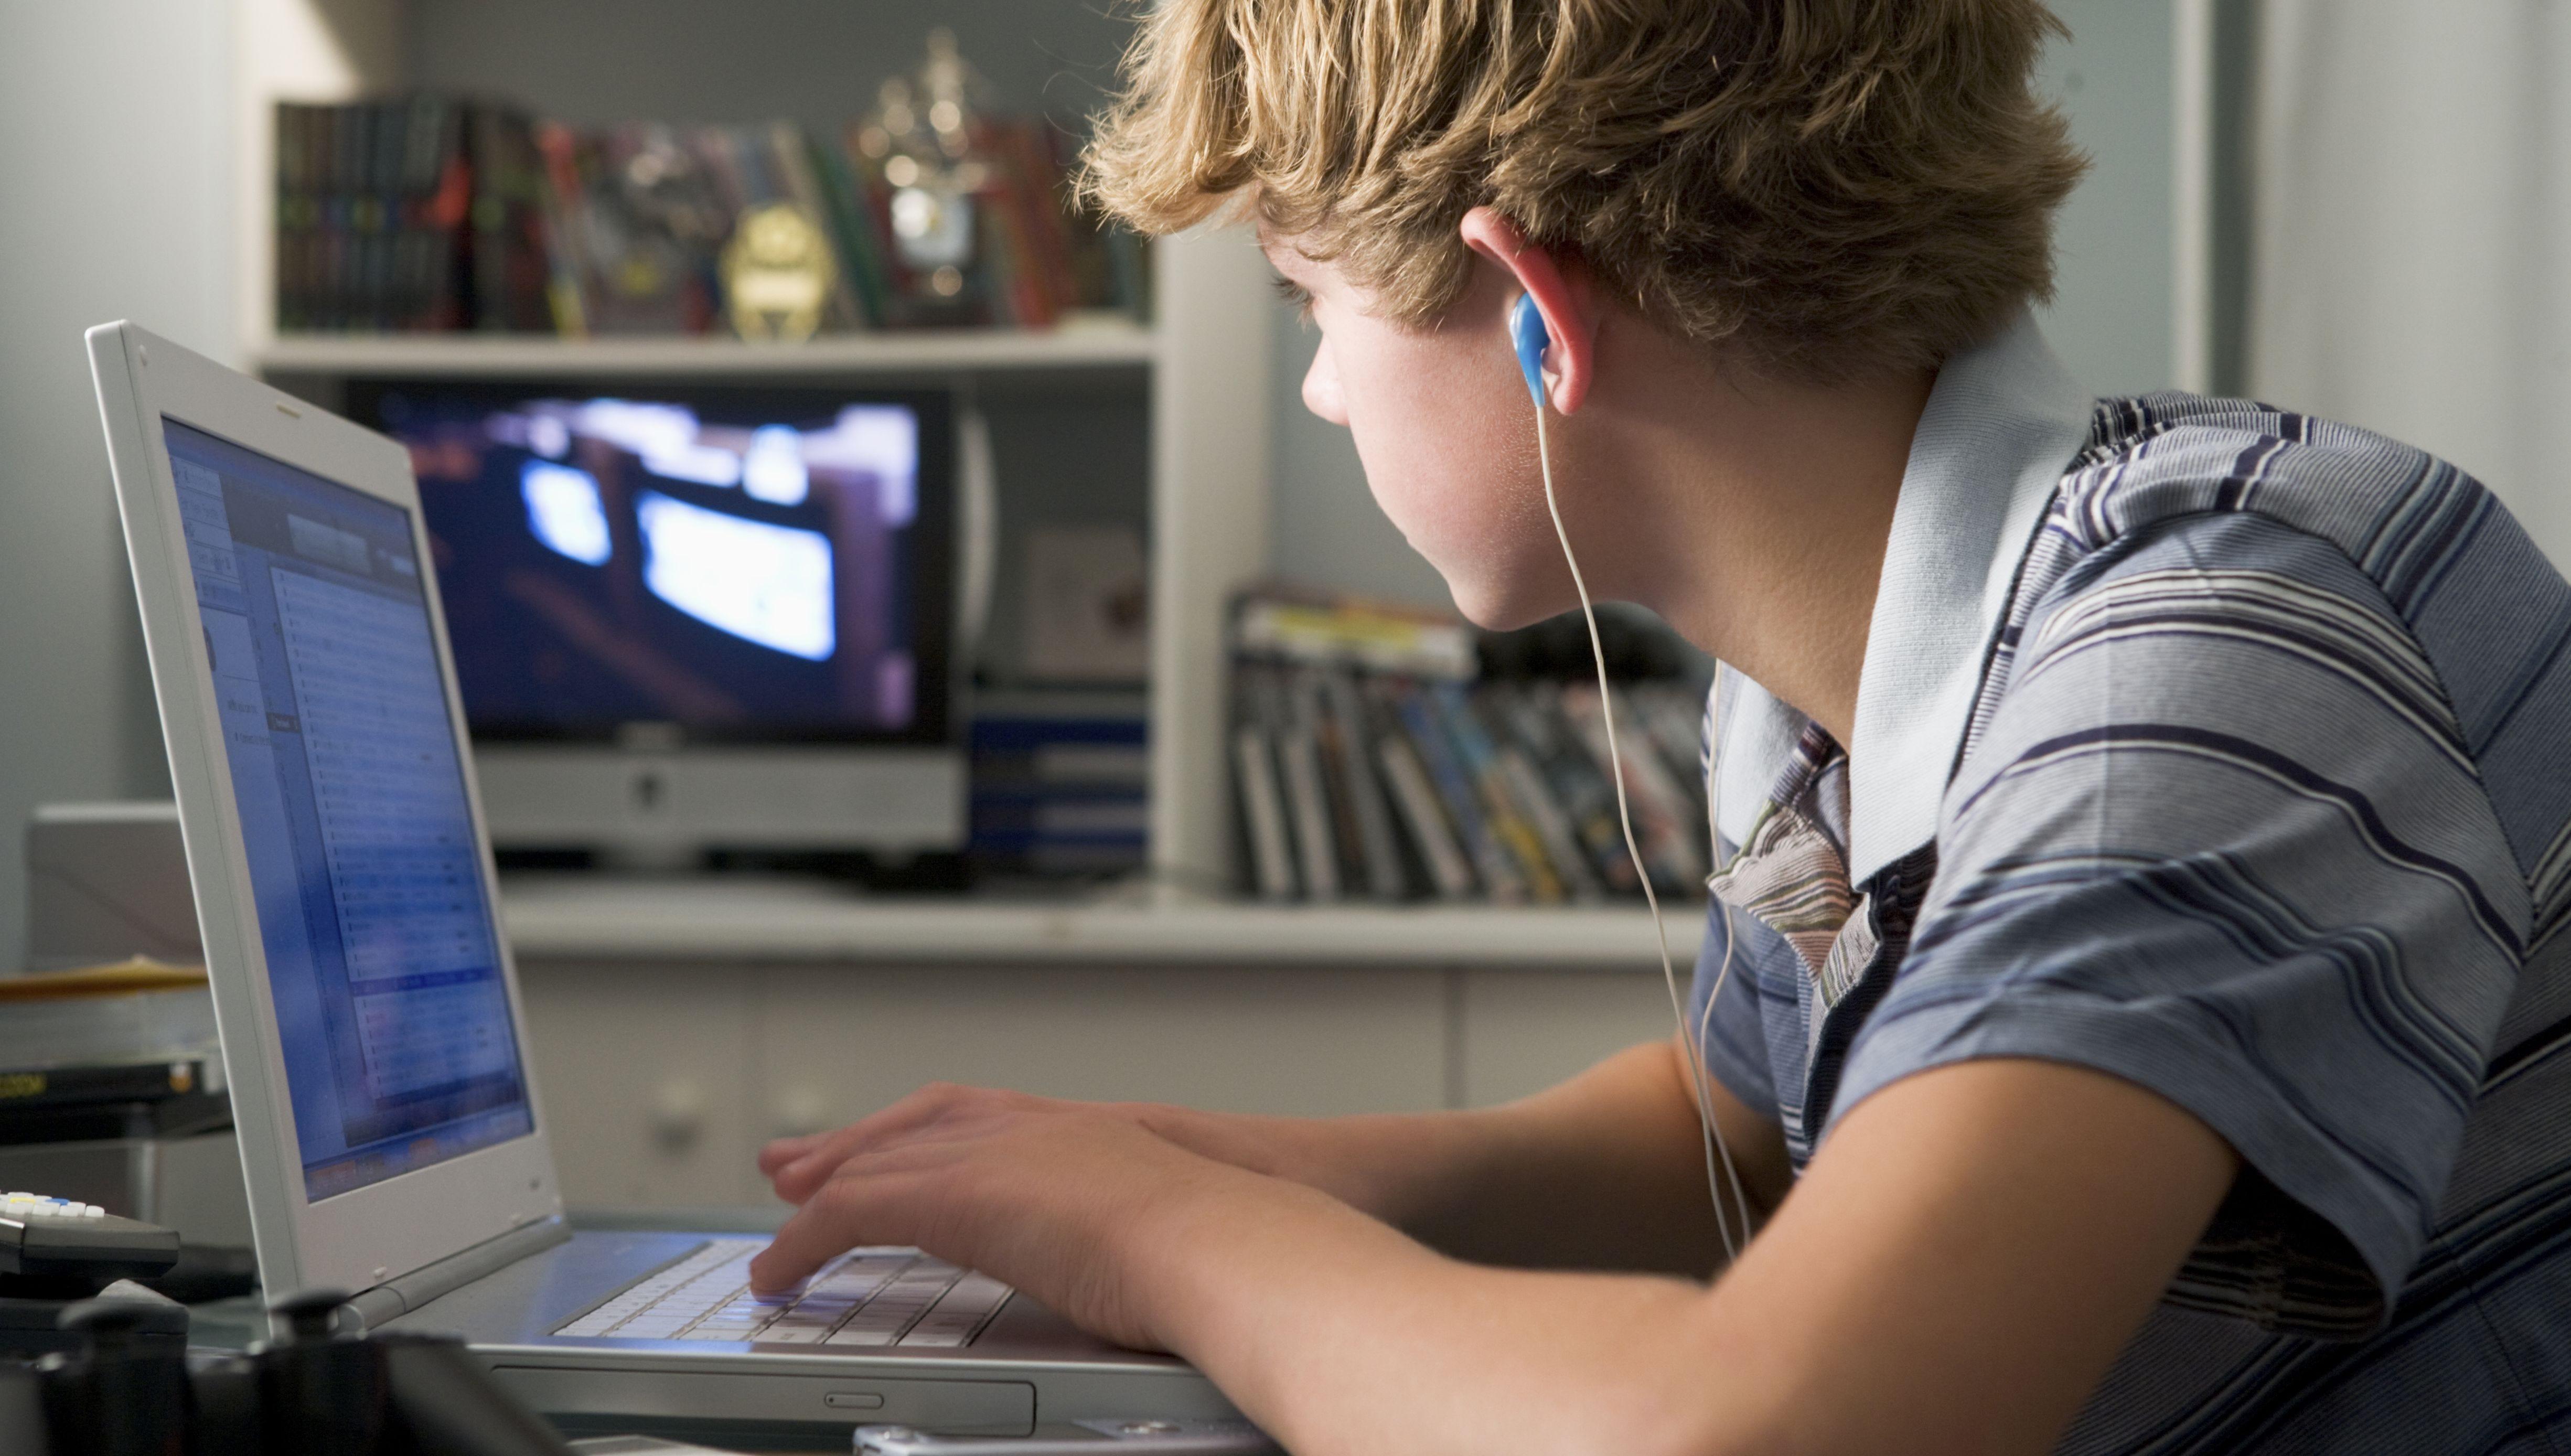 Boy on a computer.